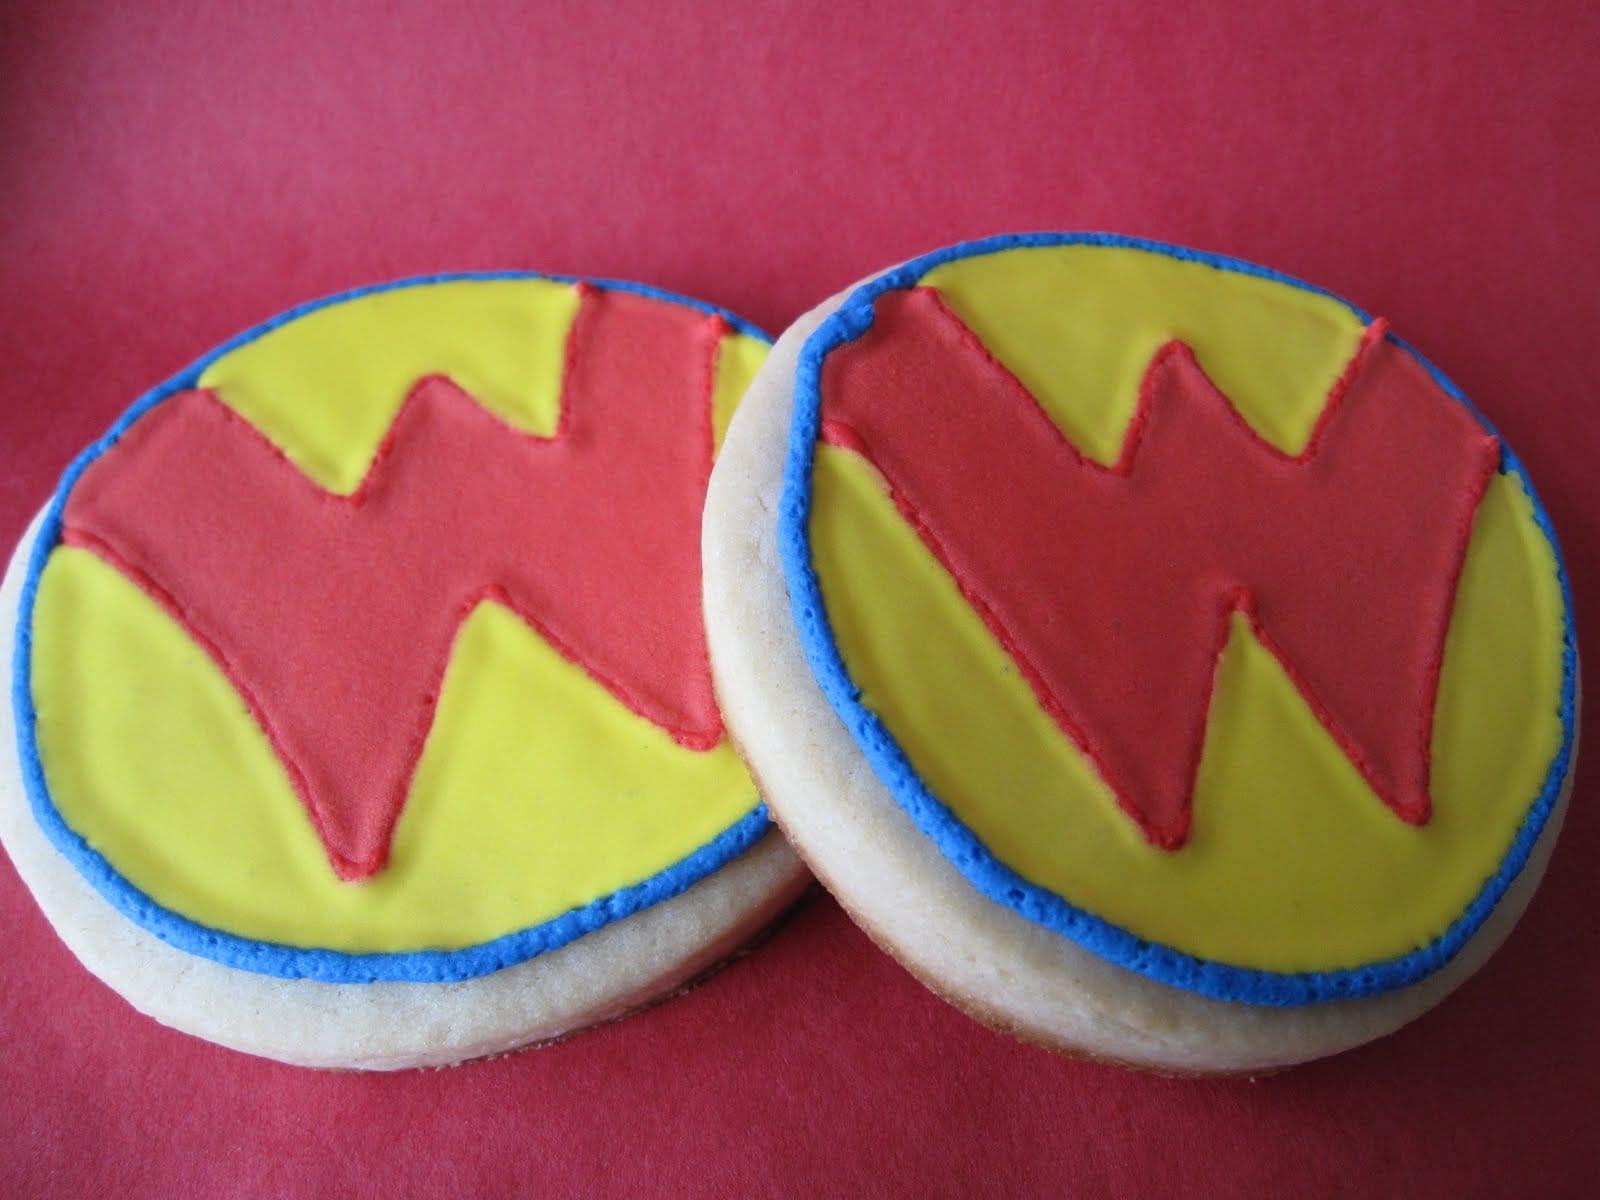 Two round Wonder Pets logo cookies